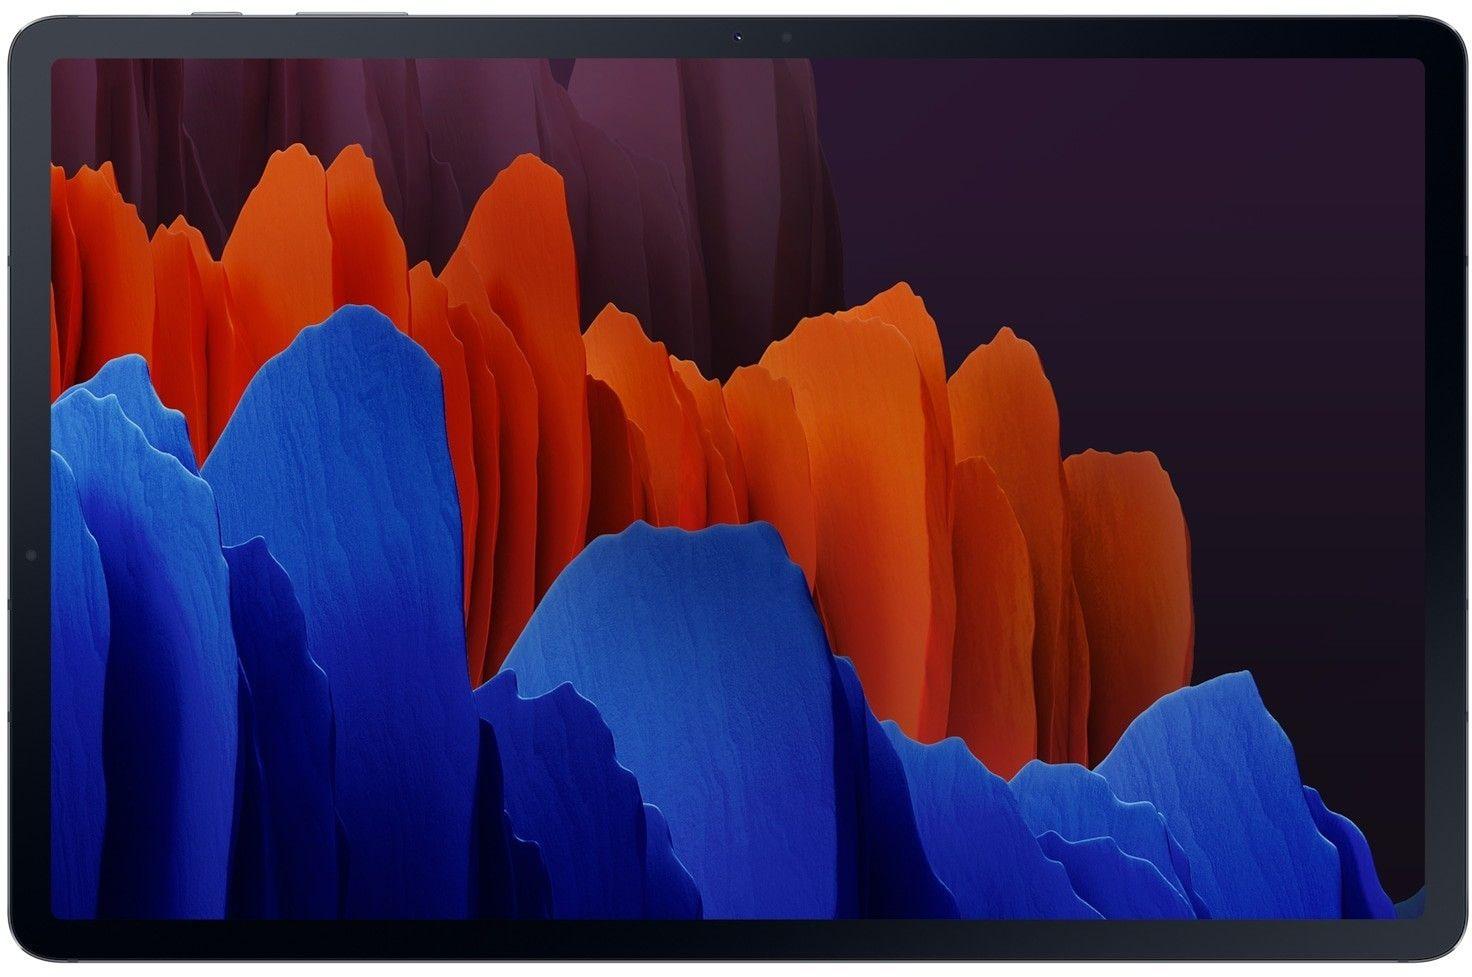 Samsung Galaxy Tab S7 Plus 5G 256GB + Cover im Vodafone Smart XL Boost (40GB 5G, Allnet/SMS, VoLTE und VoWiFi) mtl. 44,91€ einm. 49€